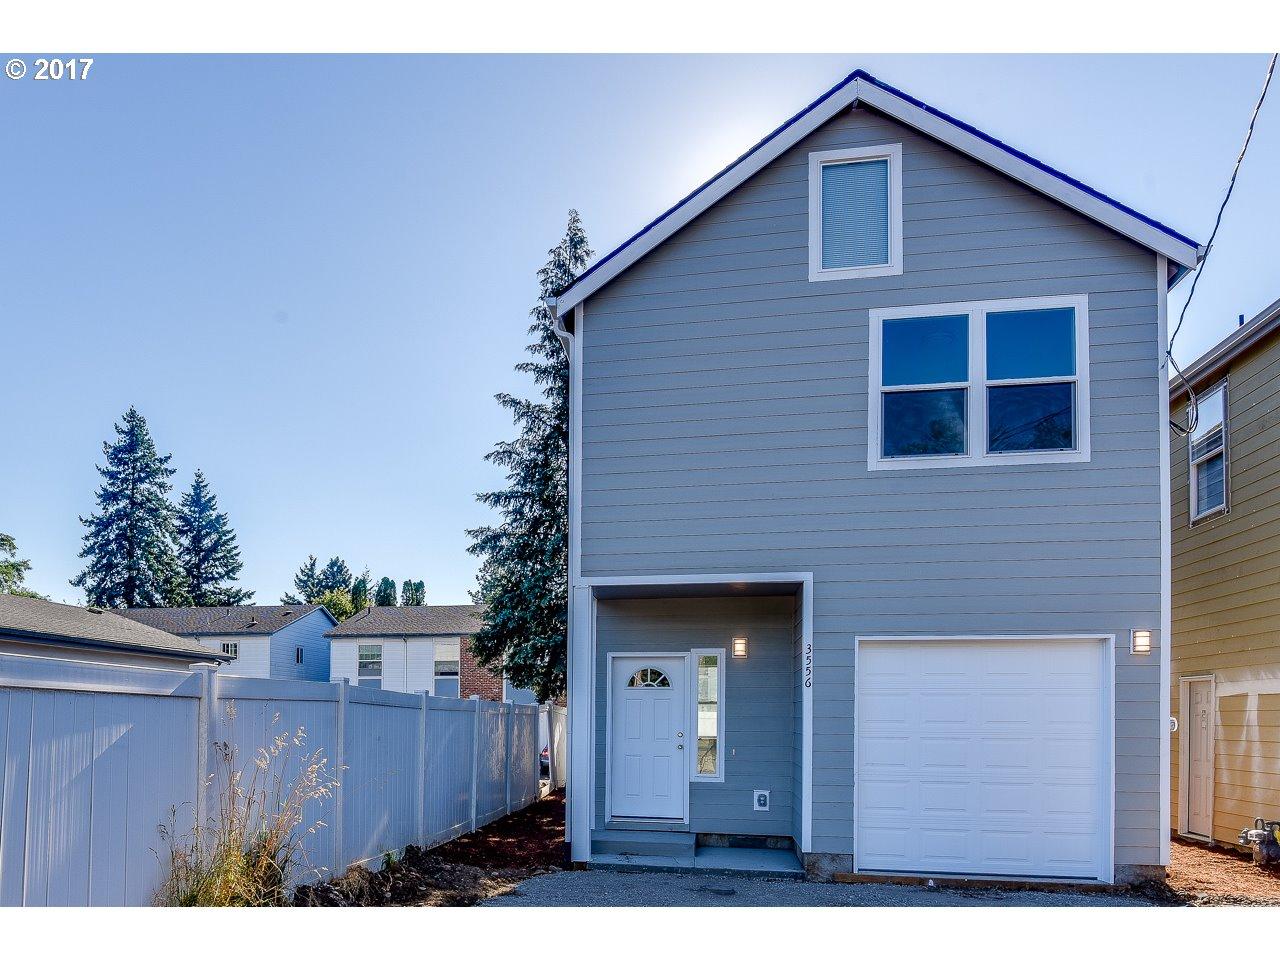 3556 SE 130TH AVE, Portland, OR 97236